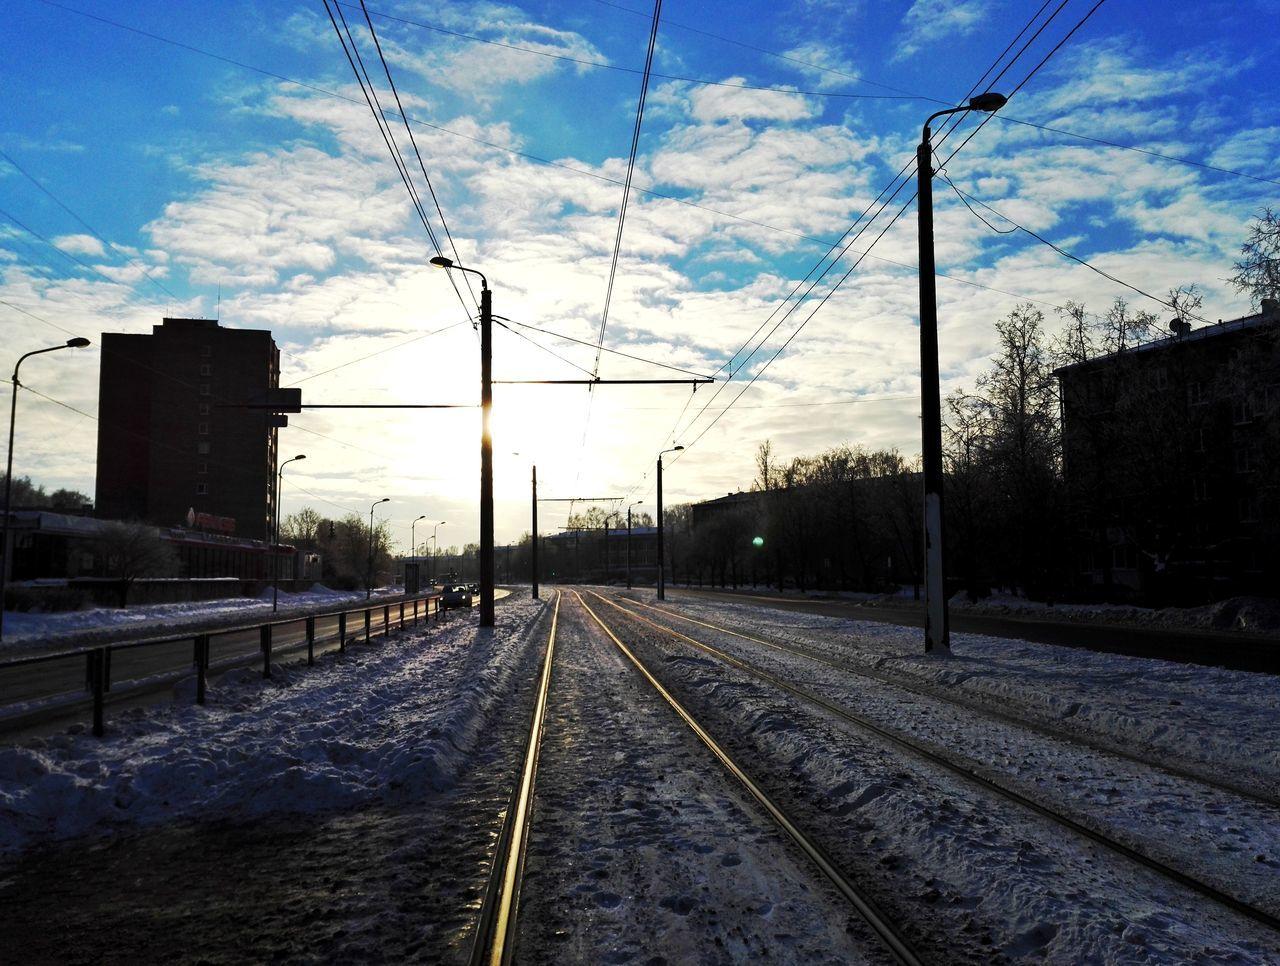 Transportation Railroad Track Rail Transportation Sky The Way Forward Cloud - Sky Day City Weather Enjoying Life Hello World Snow Cold Temperature